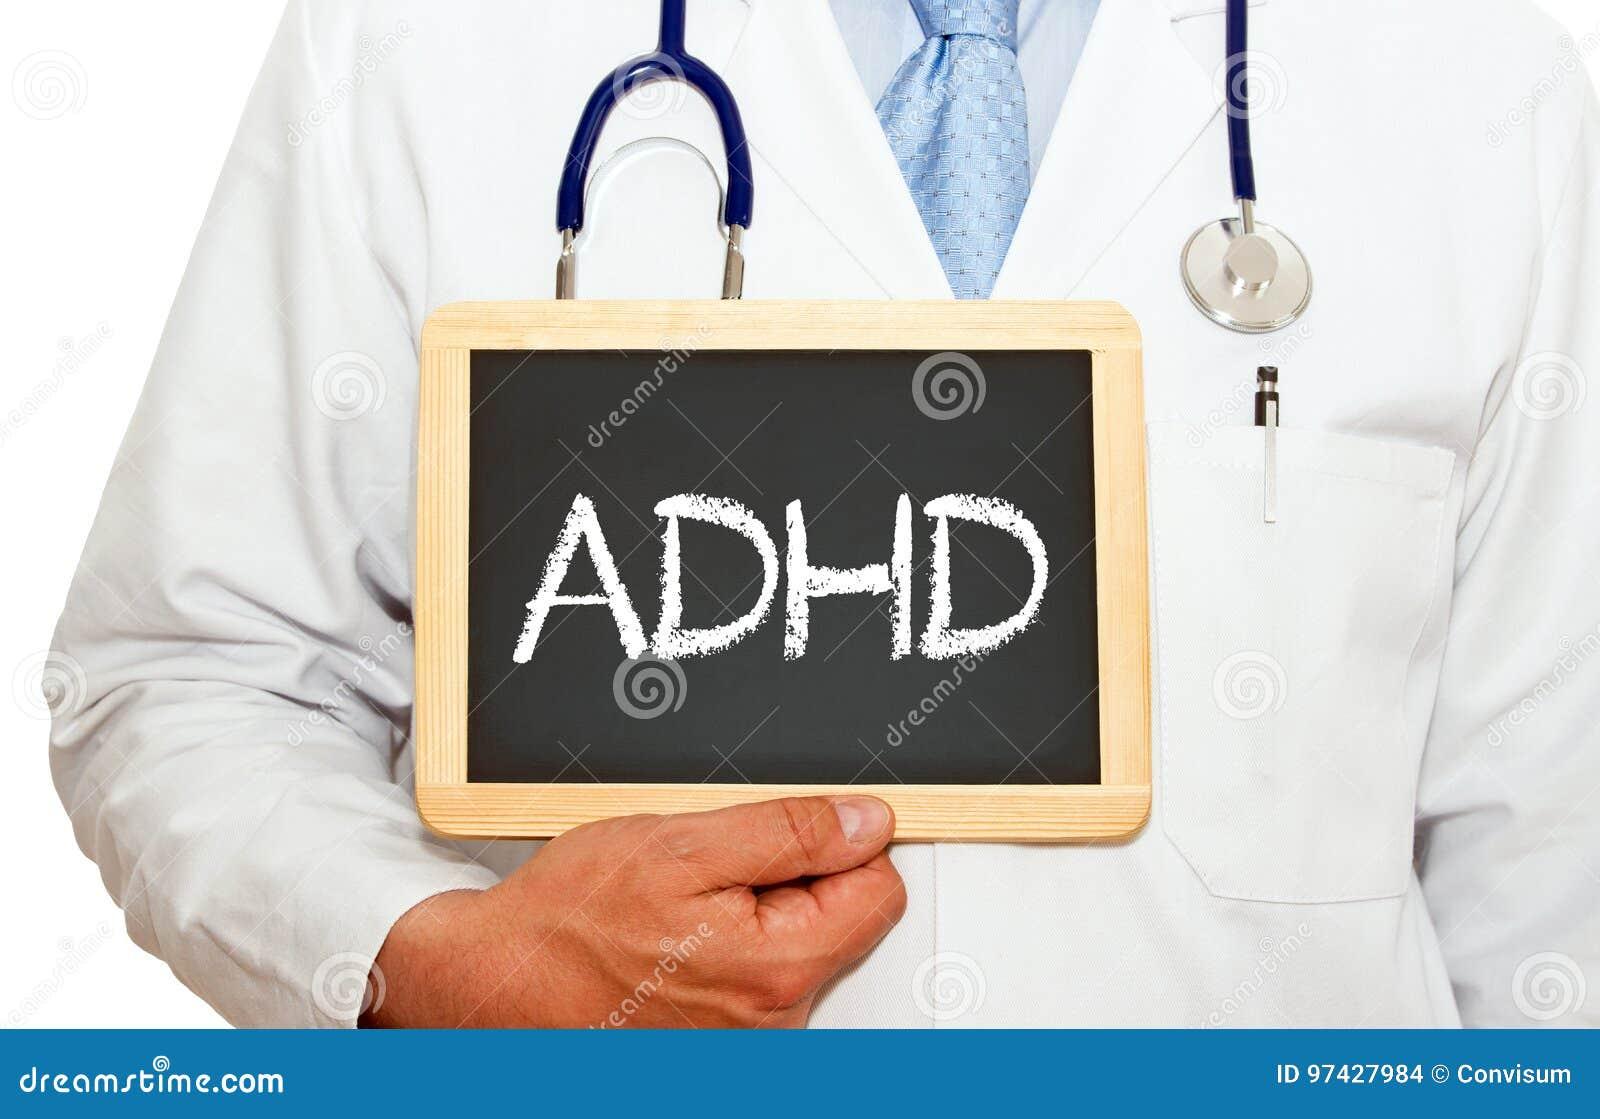 ADHD - Disordine di iperattività di deficit di attenzione